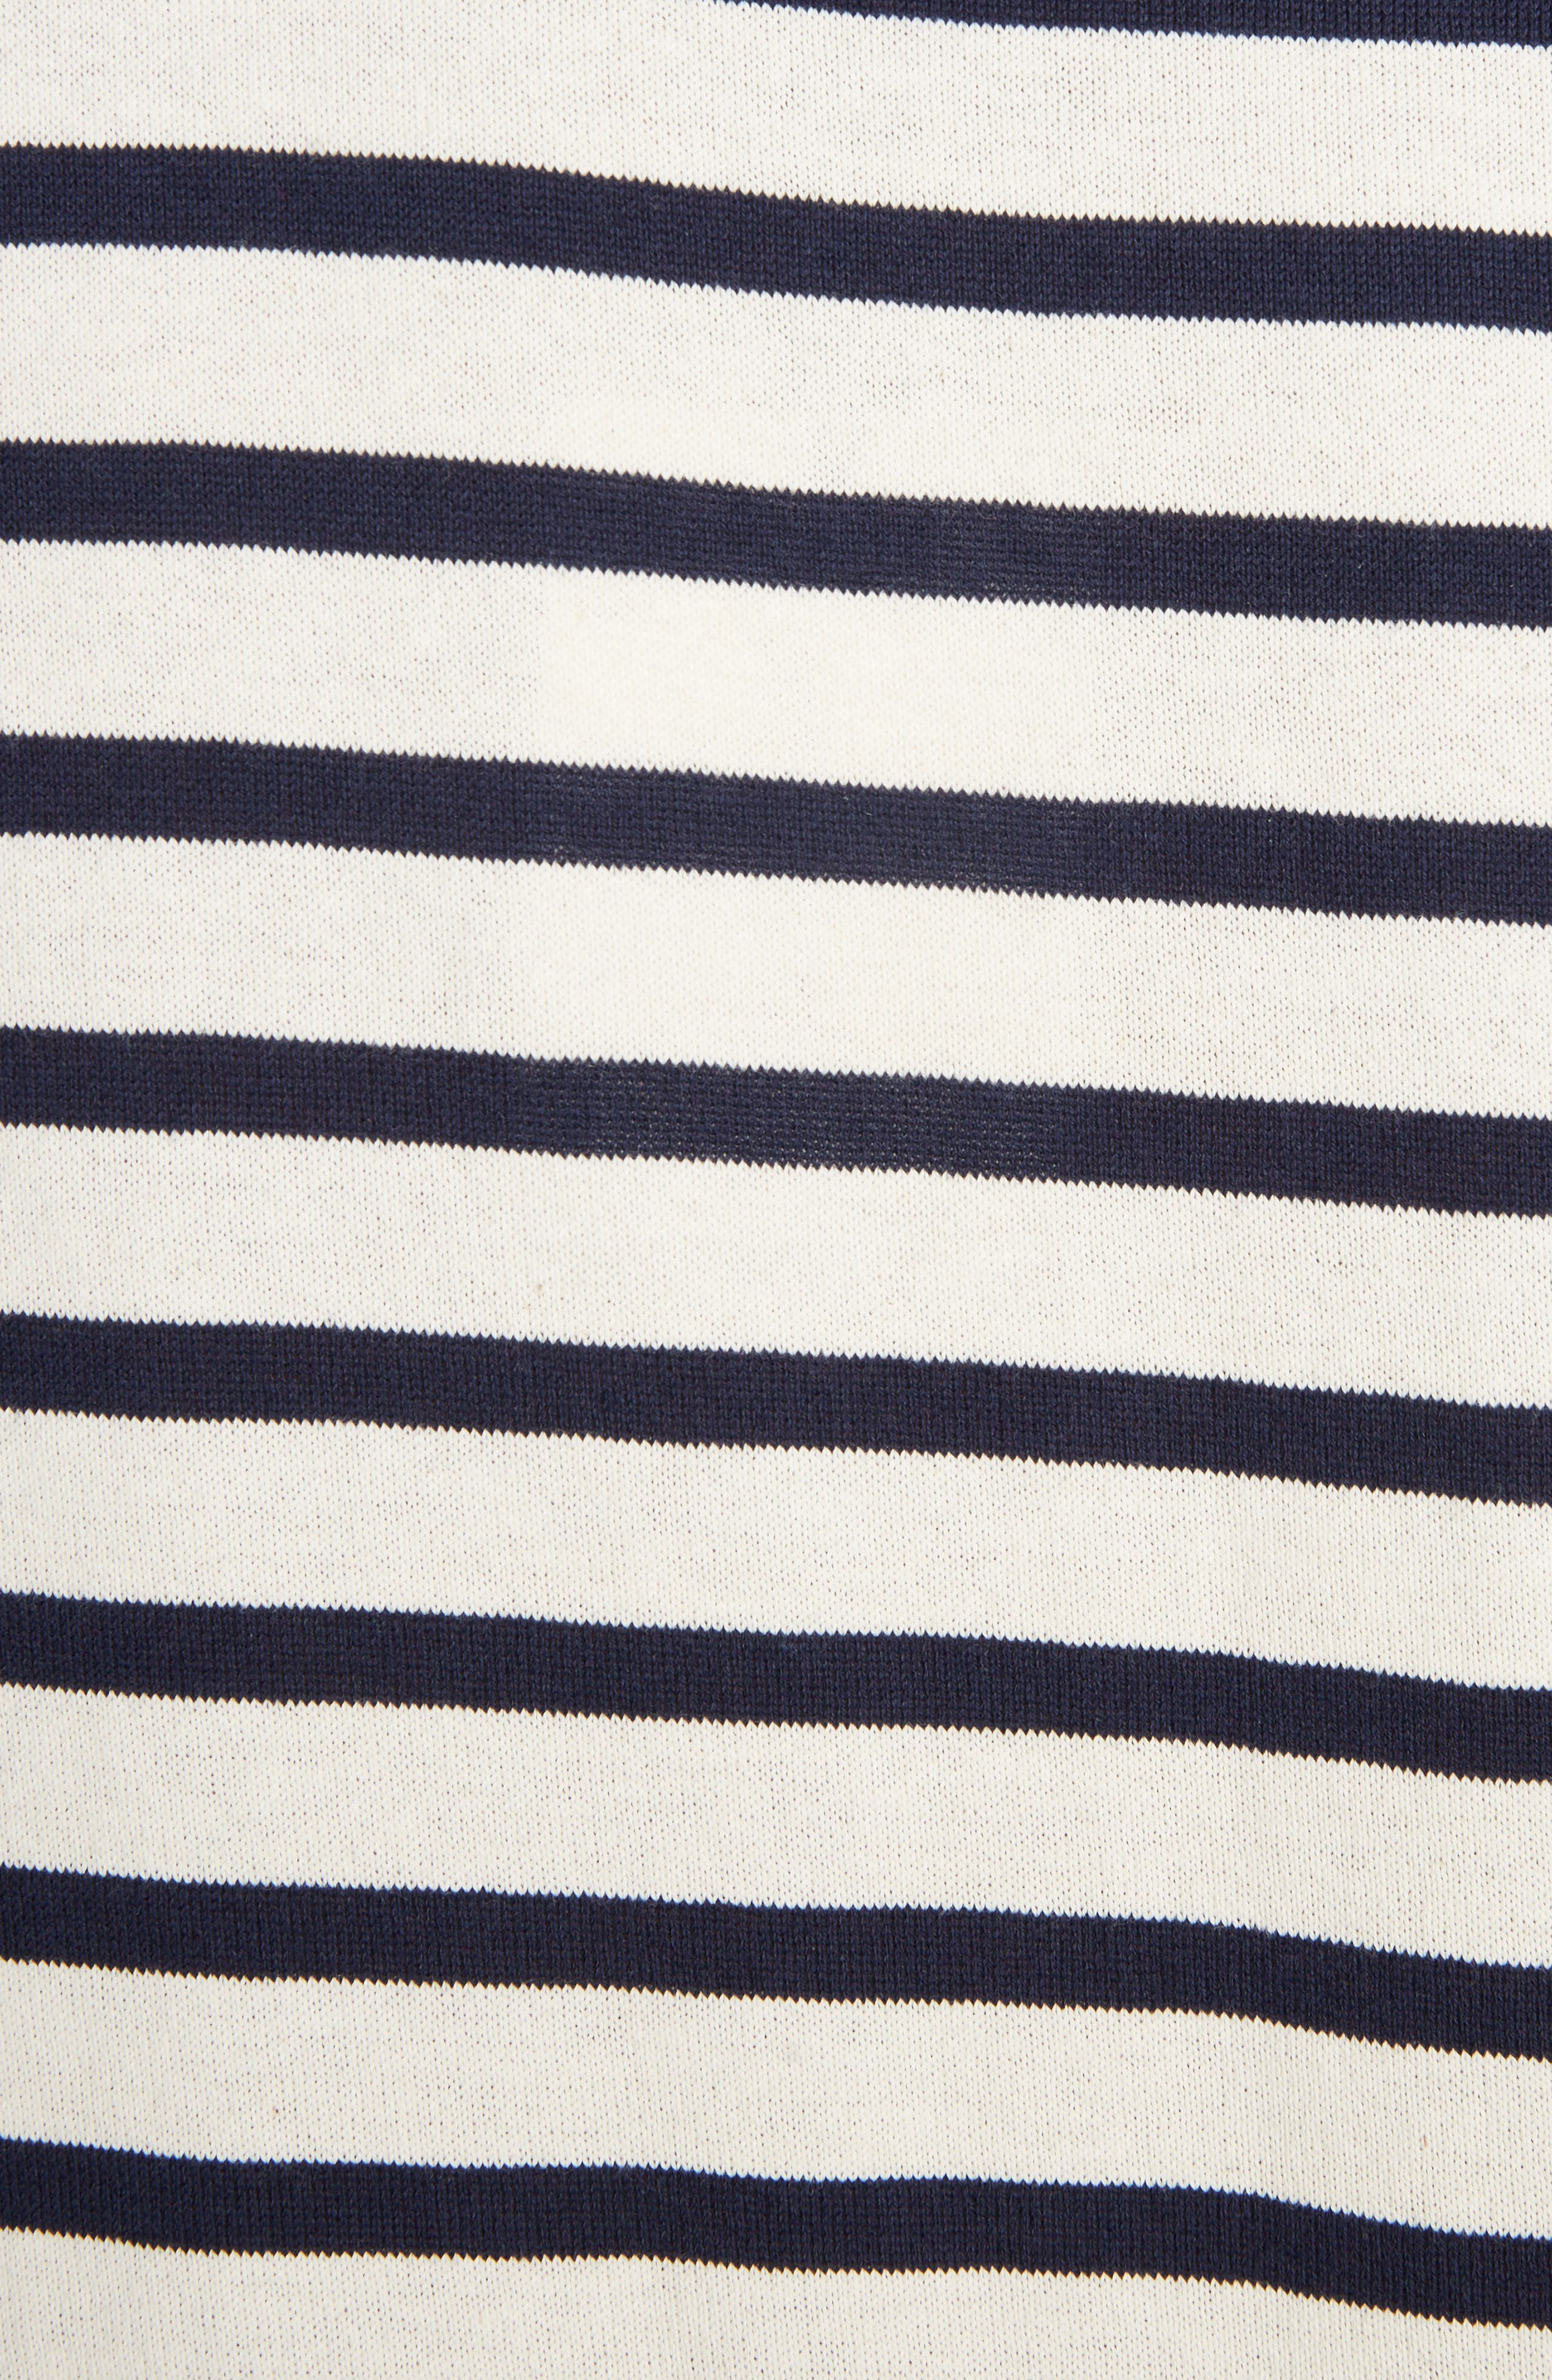 Breton Stripe Knot Sleeve Tee,                             Alternate thumbnail 5, color,                             900